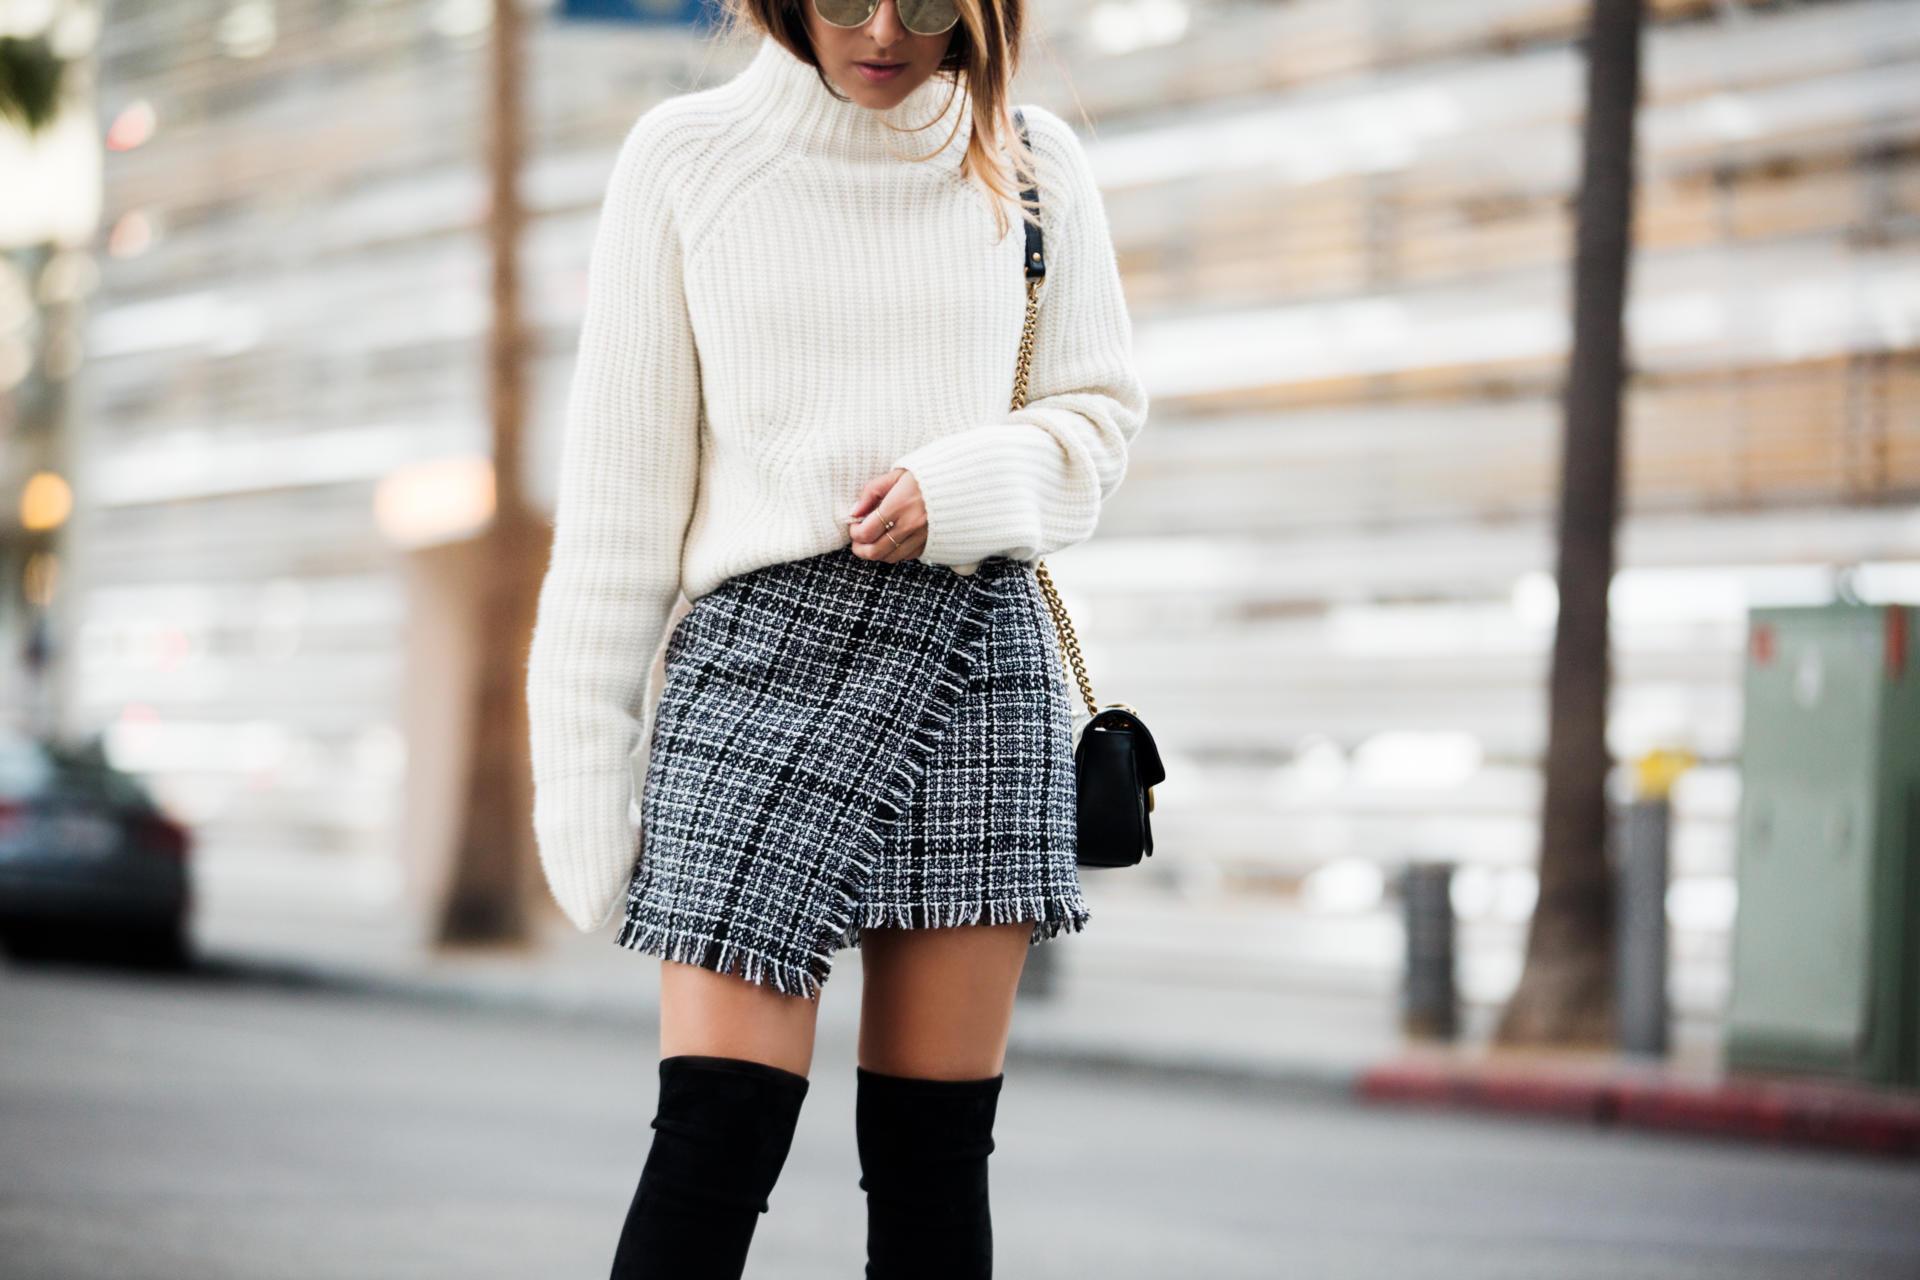 e015e6a71f20 5 τρόποι να φορέσεις την μίνι φούστα χωρίς να είσαι προκλητική ...